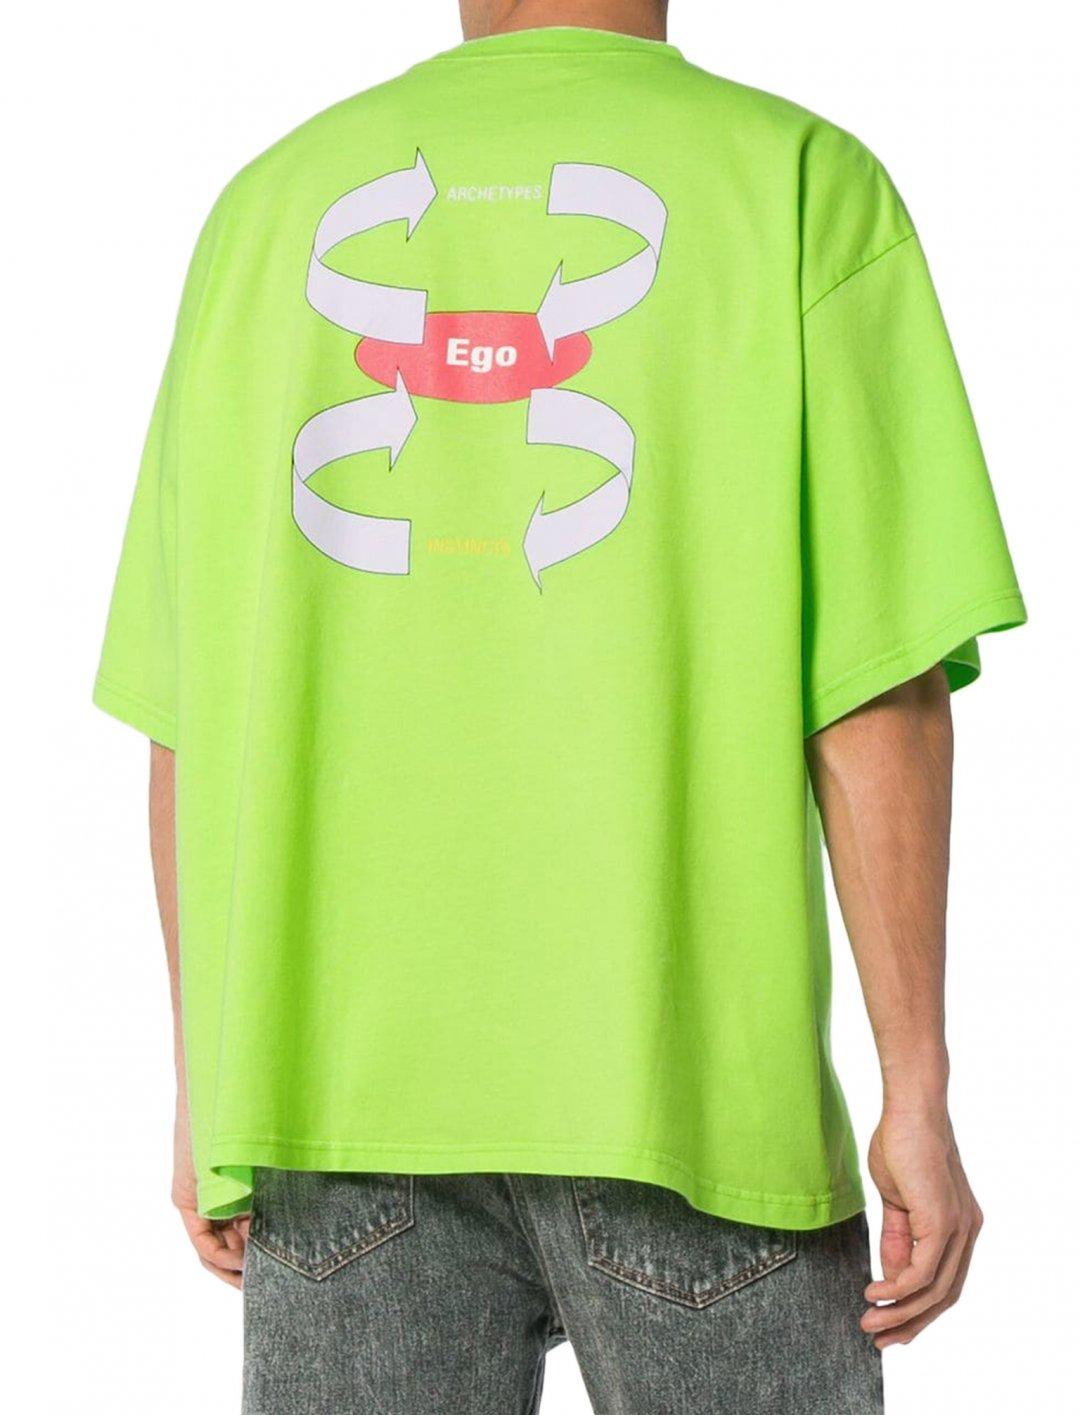 Jax Jones' T-Shirt Clothing Balenciaga